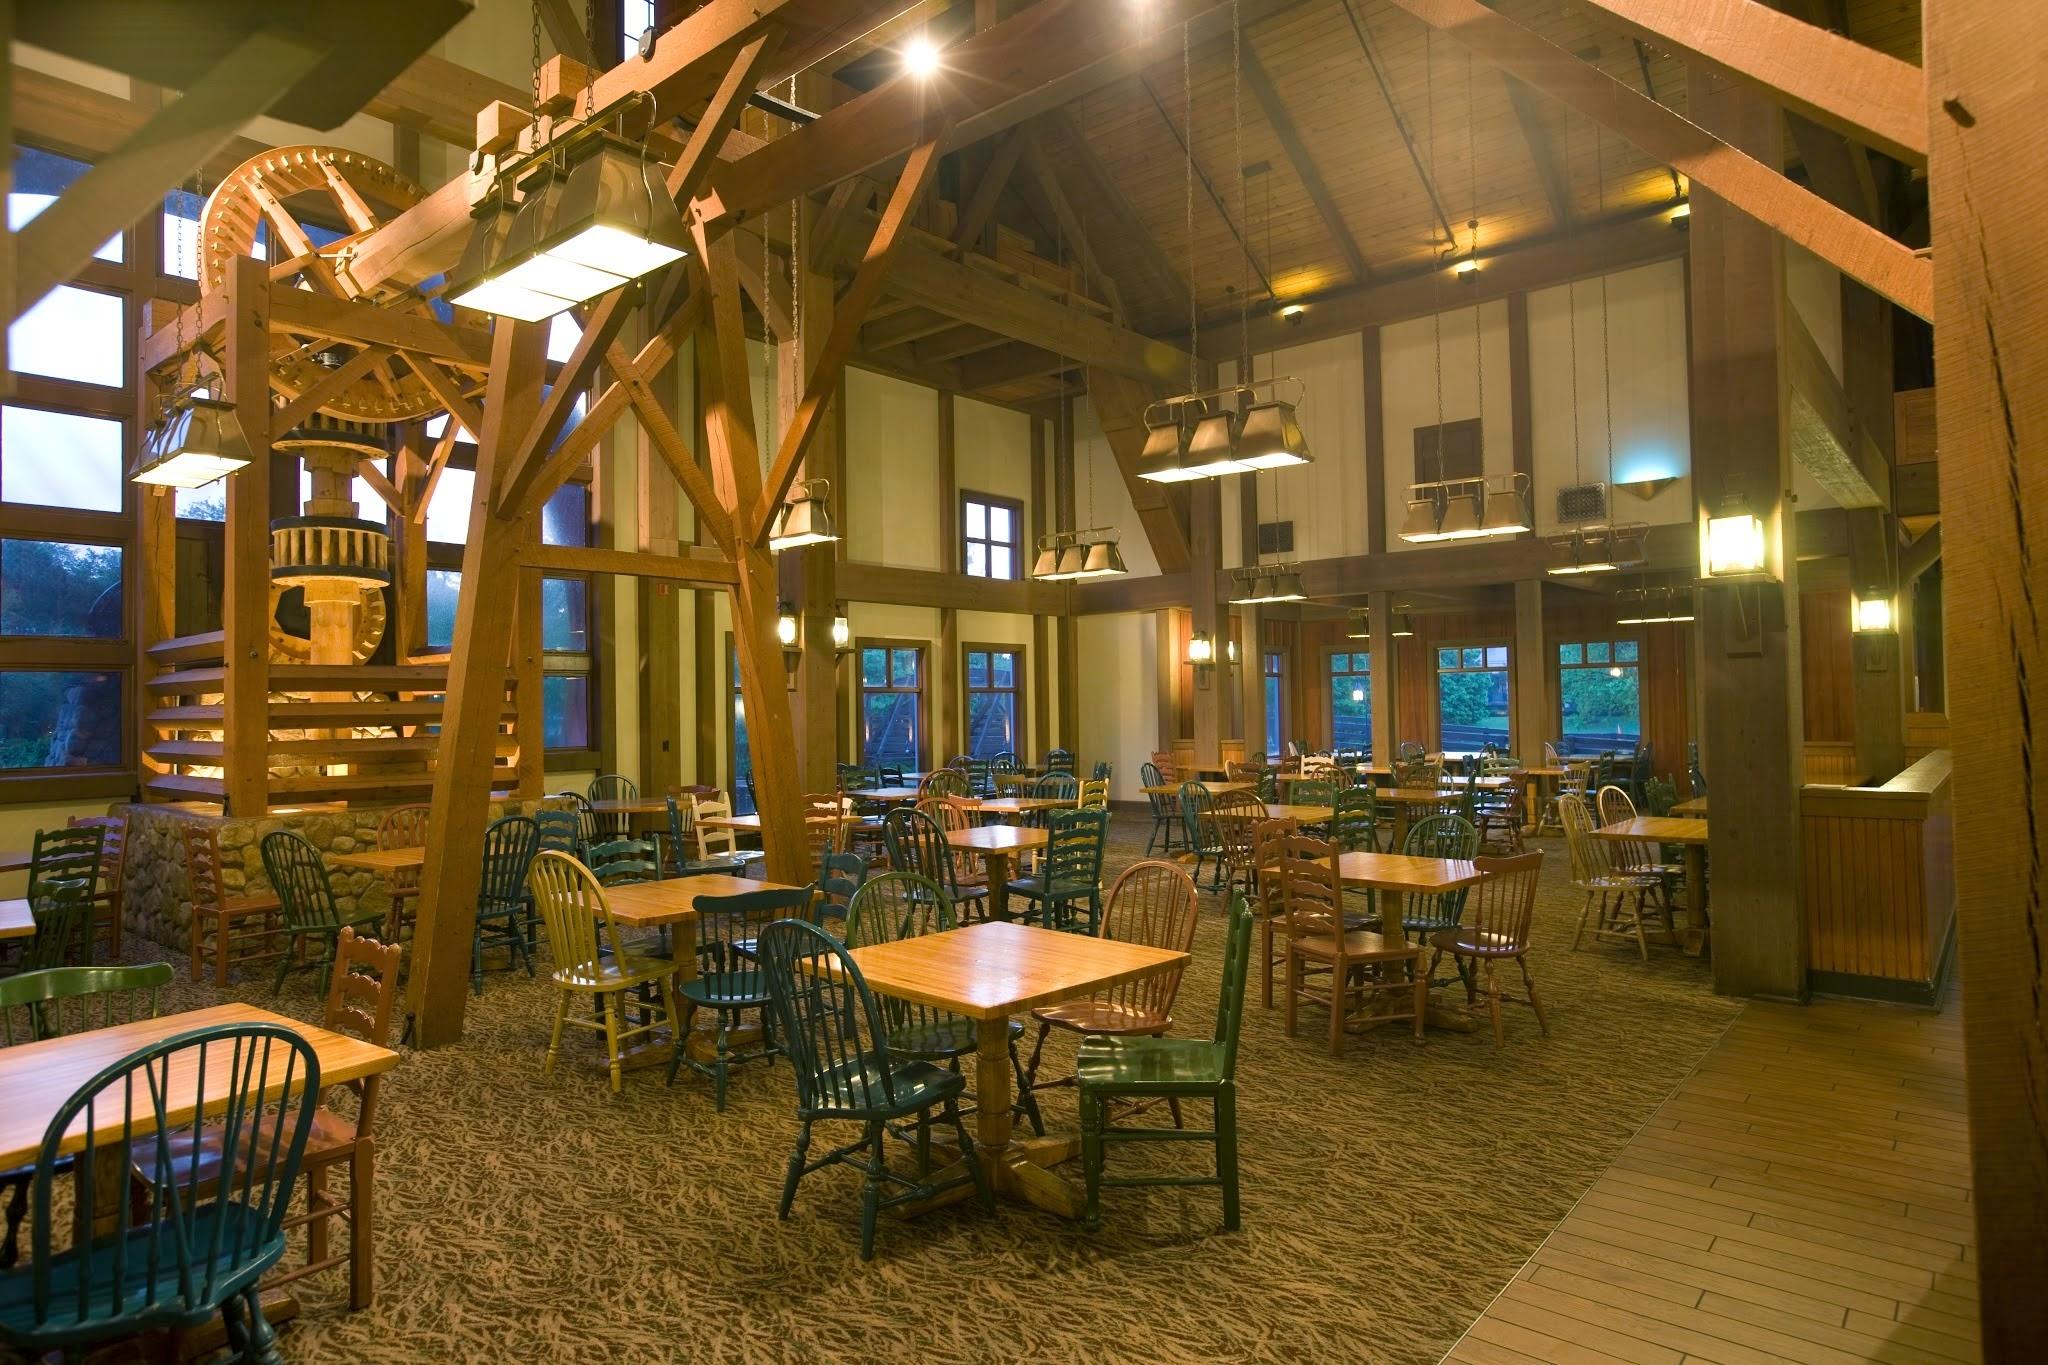 Riverside Mill Food Court image 5